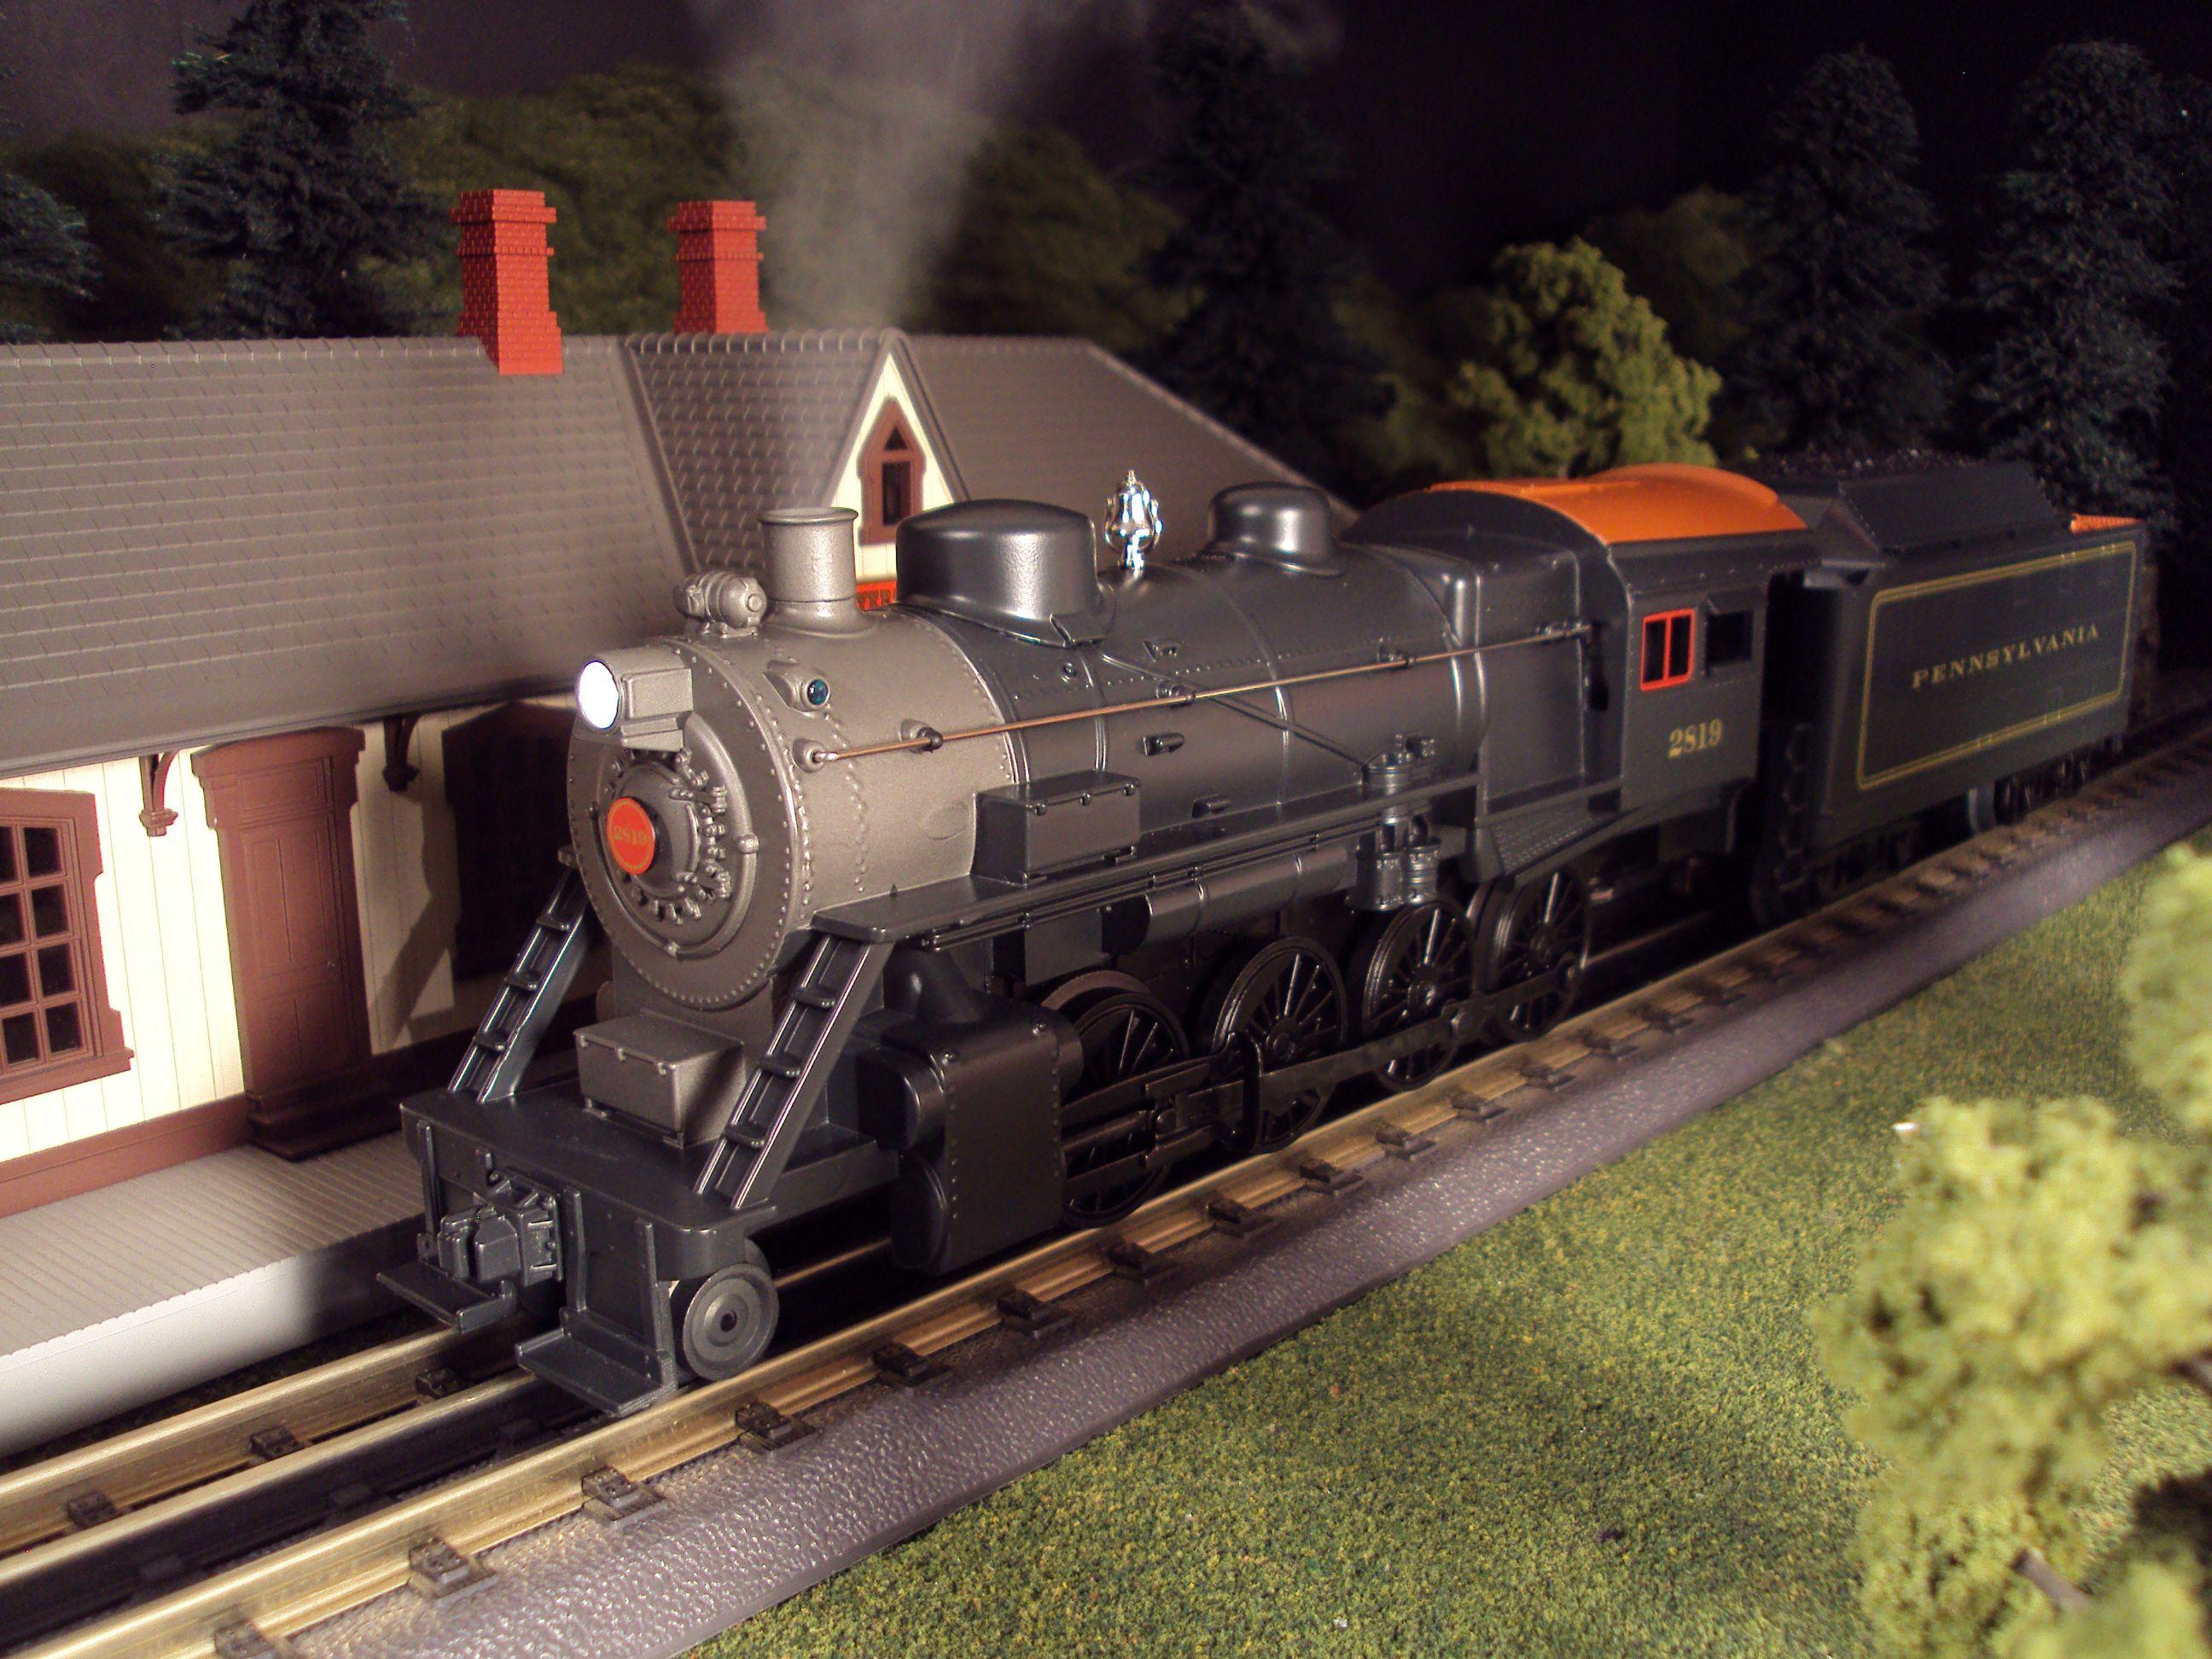 Best Now Arriving Mth Railking Rugged Rail Pennsylvania 2 8 400 x 300